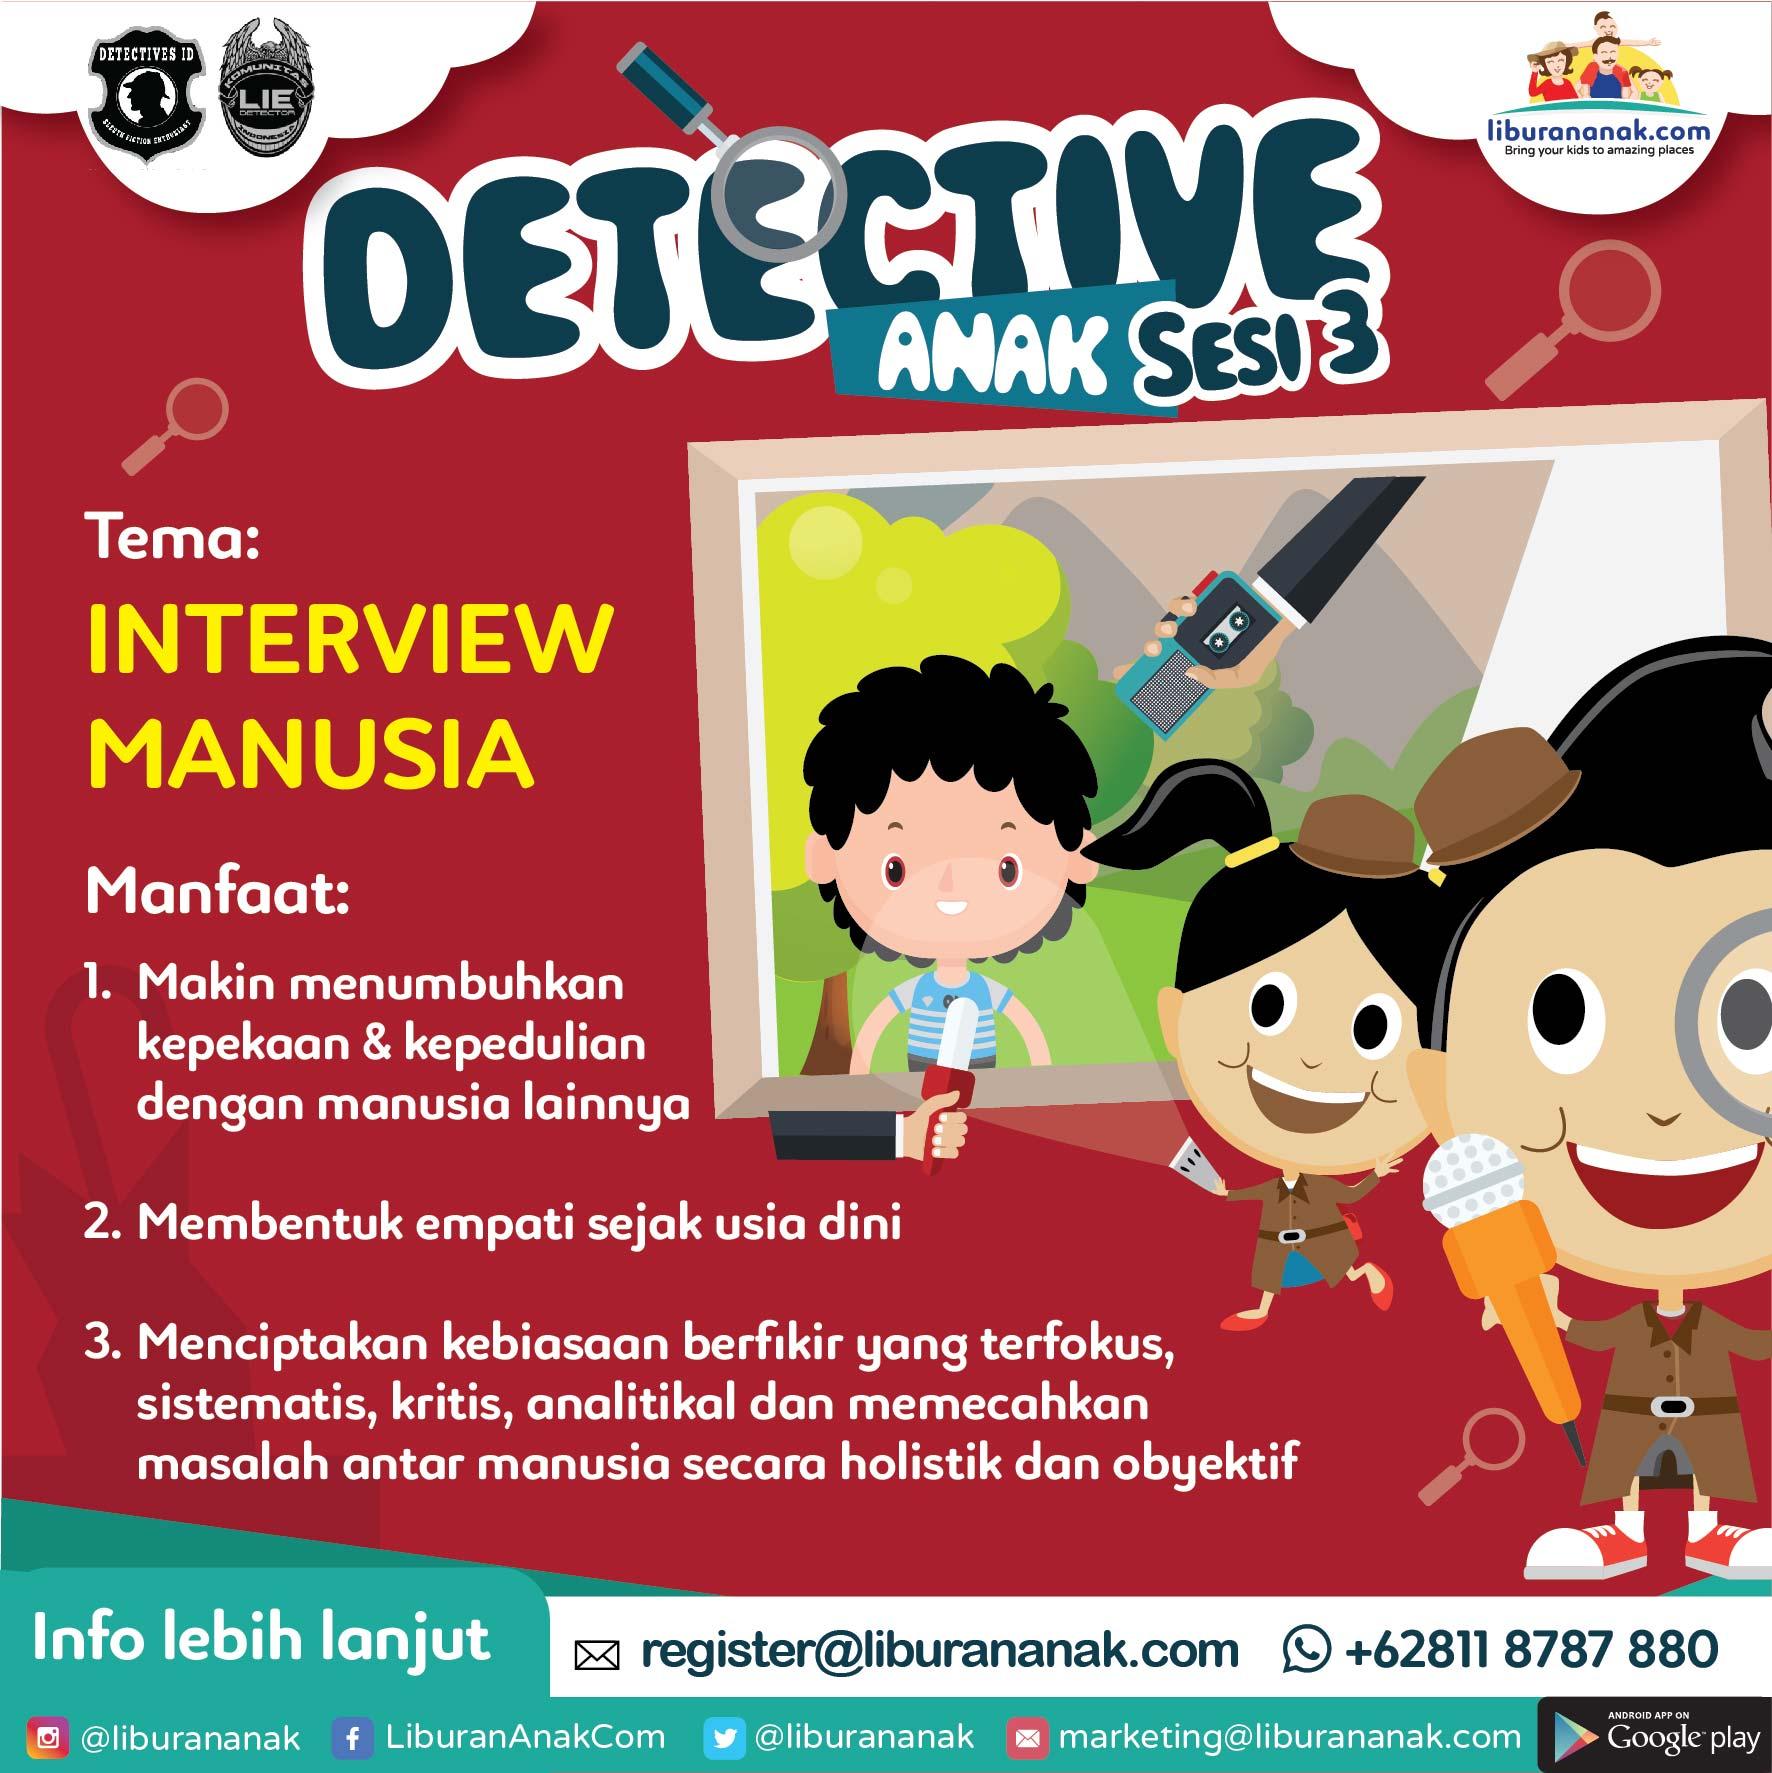 liburananak_detective-anak-sesi3